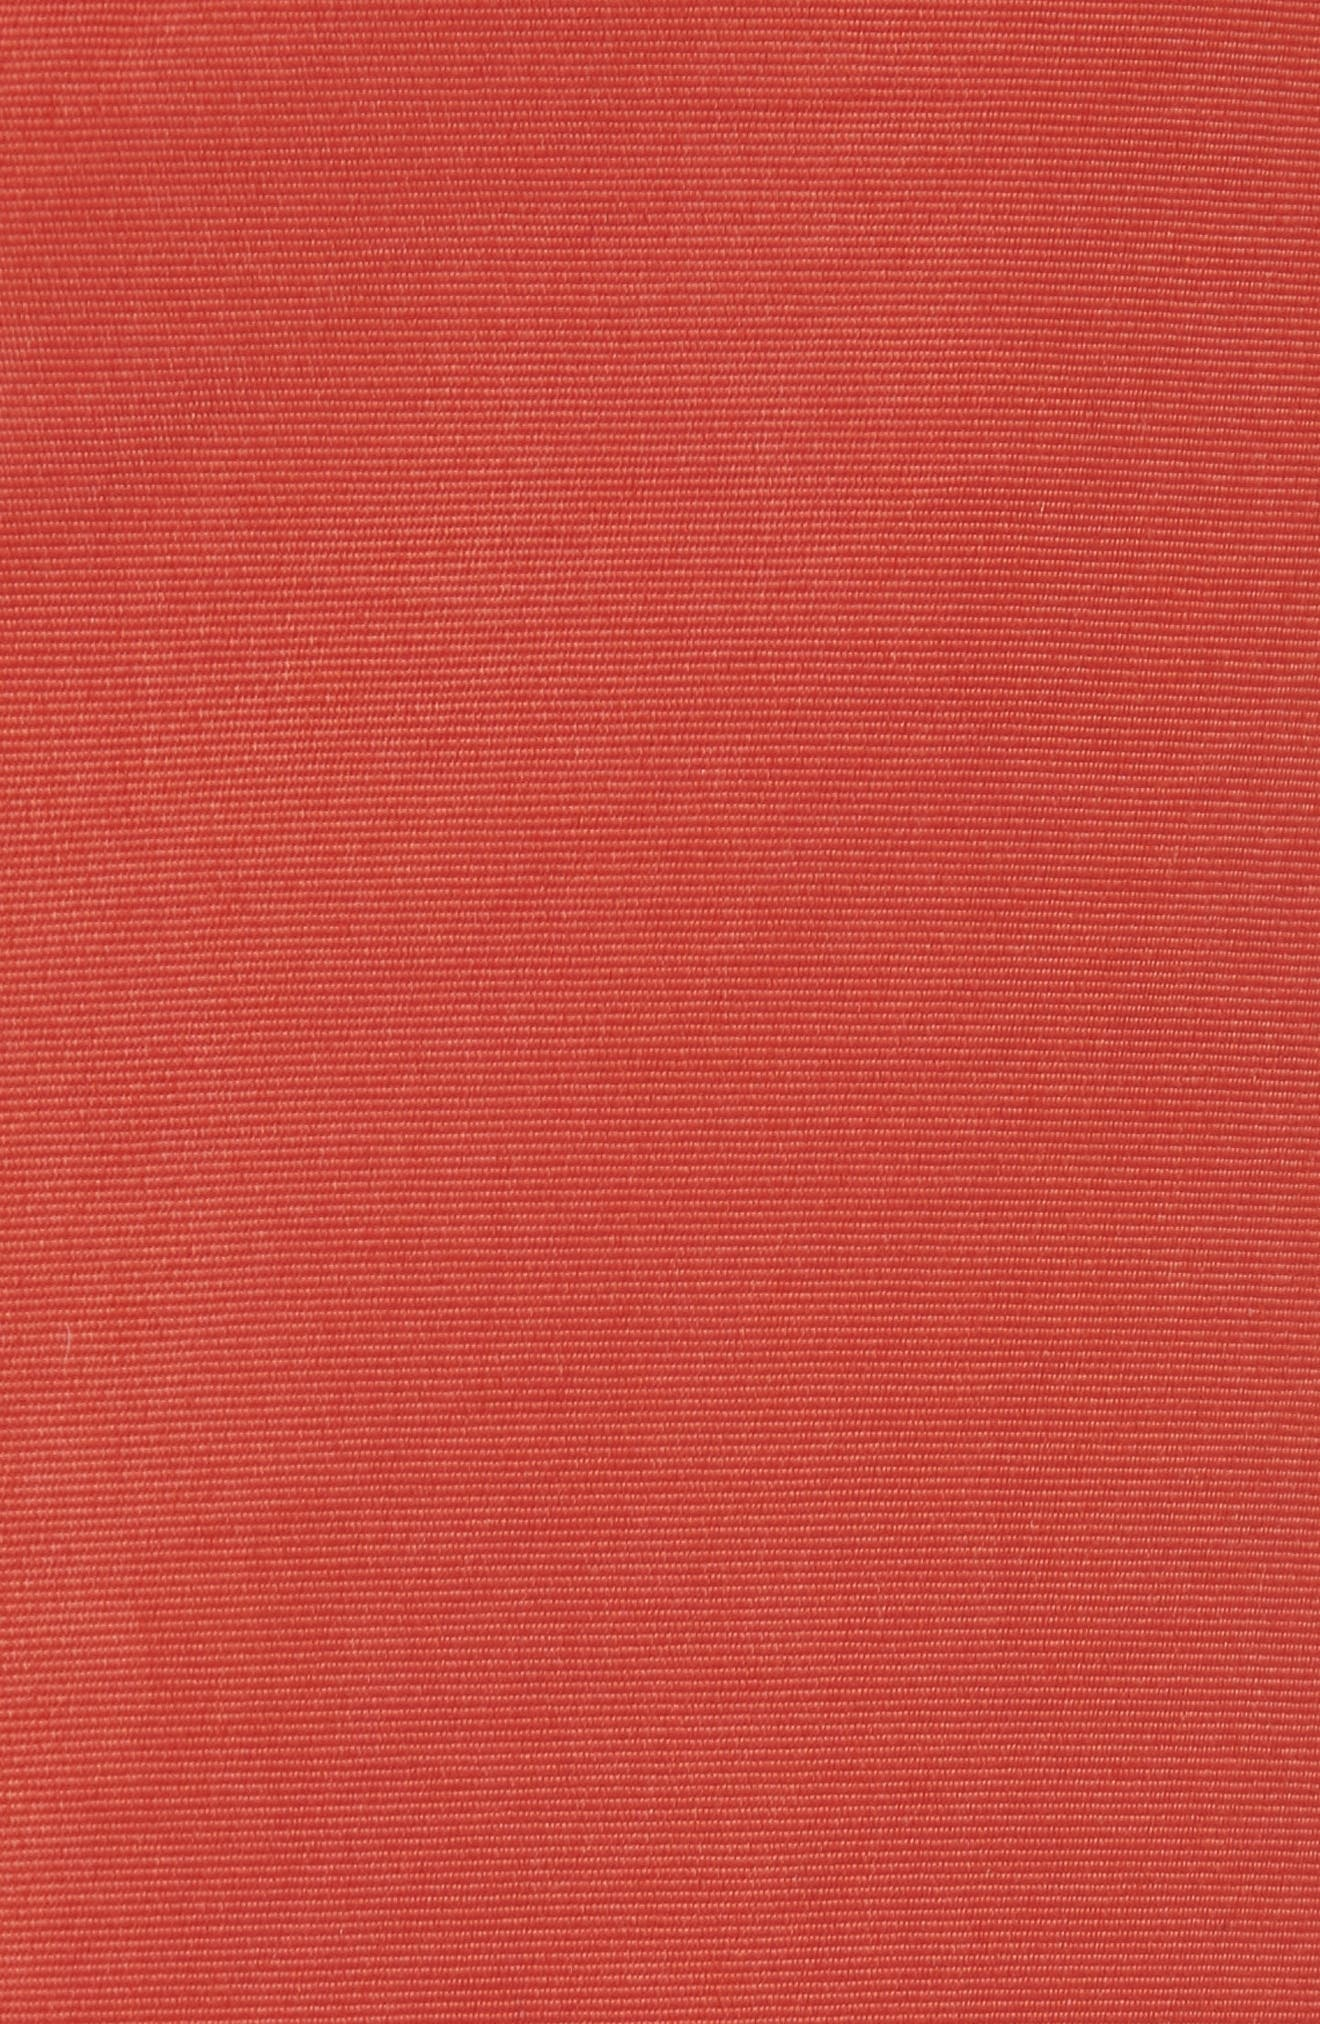 Colin Board Shorts,                             Alternate thumbnail 5, color,                             600